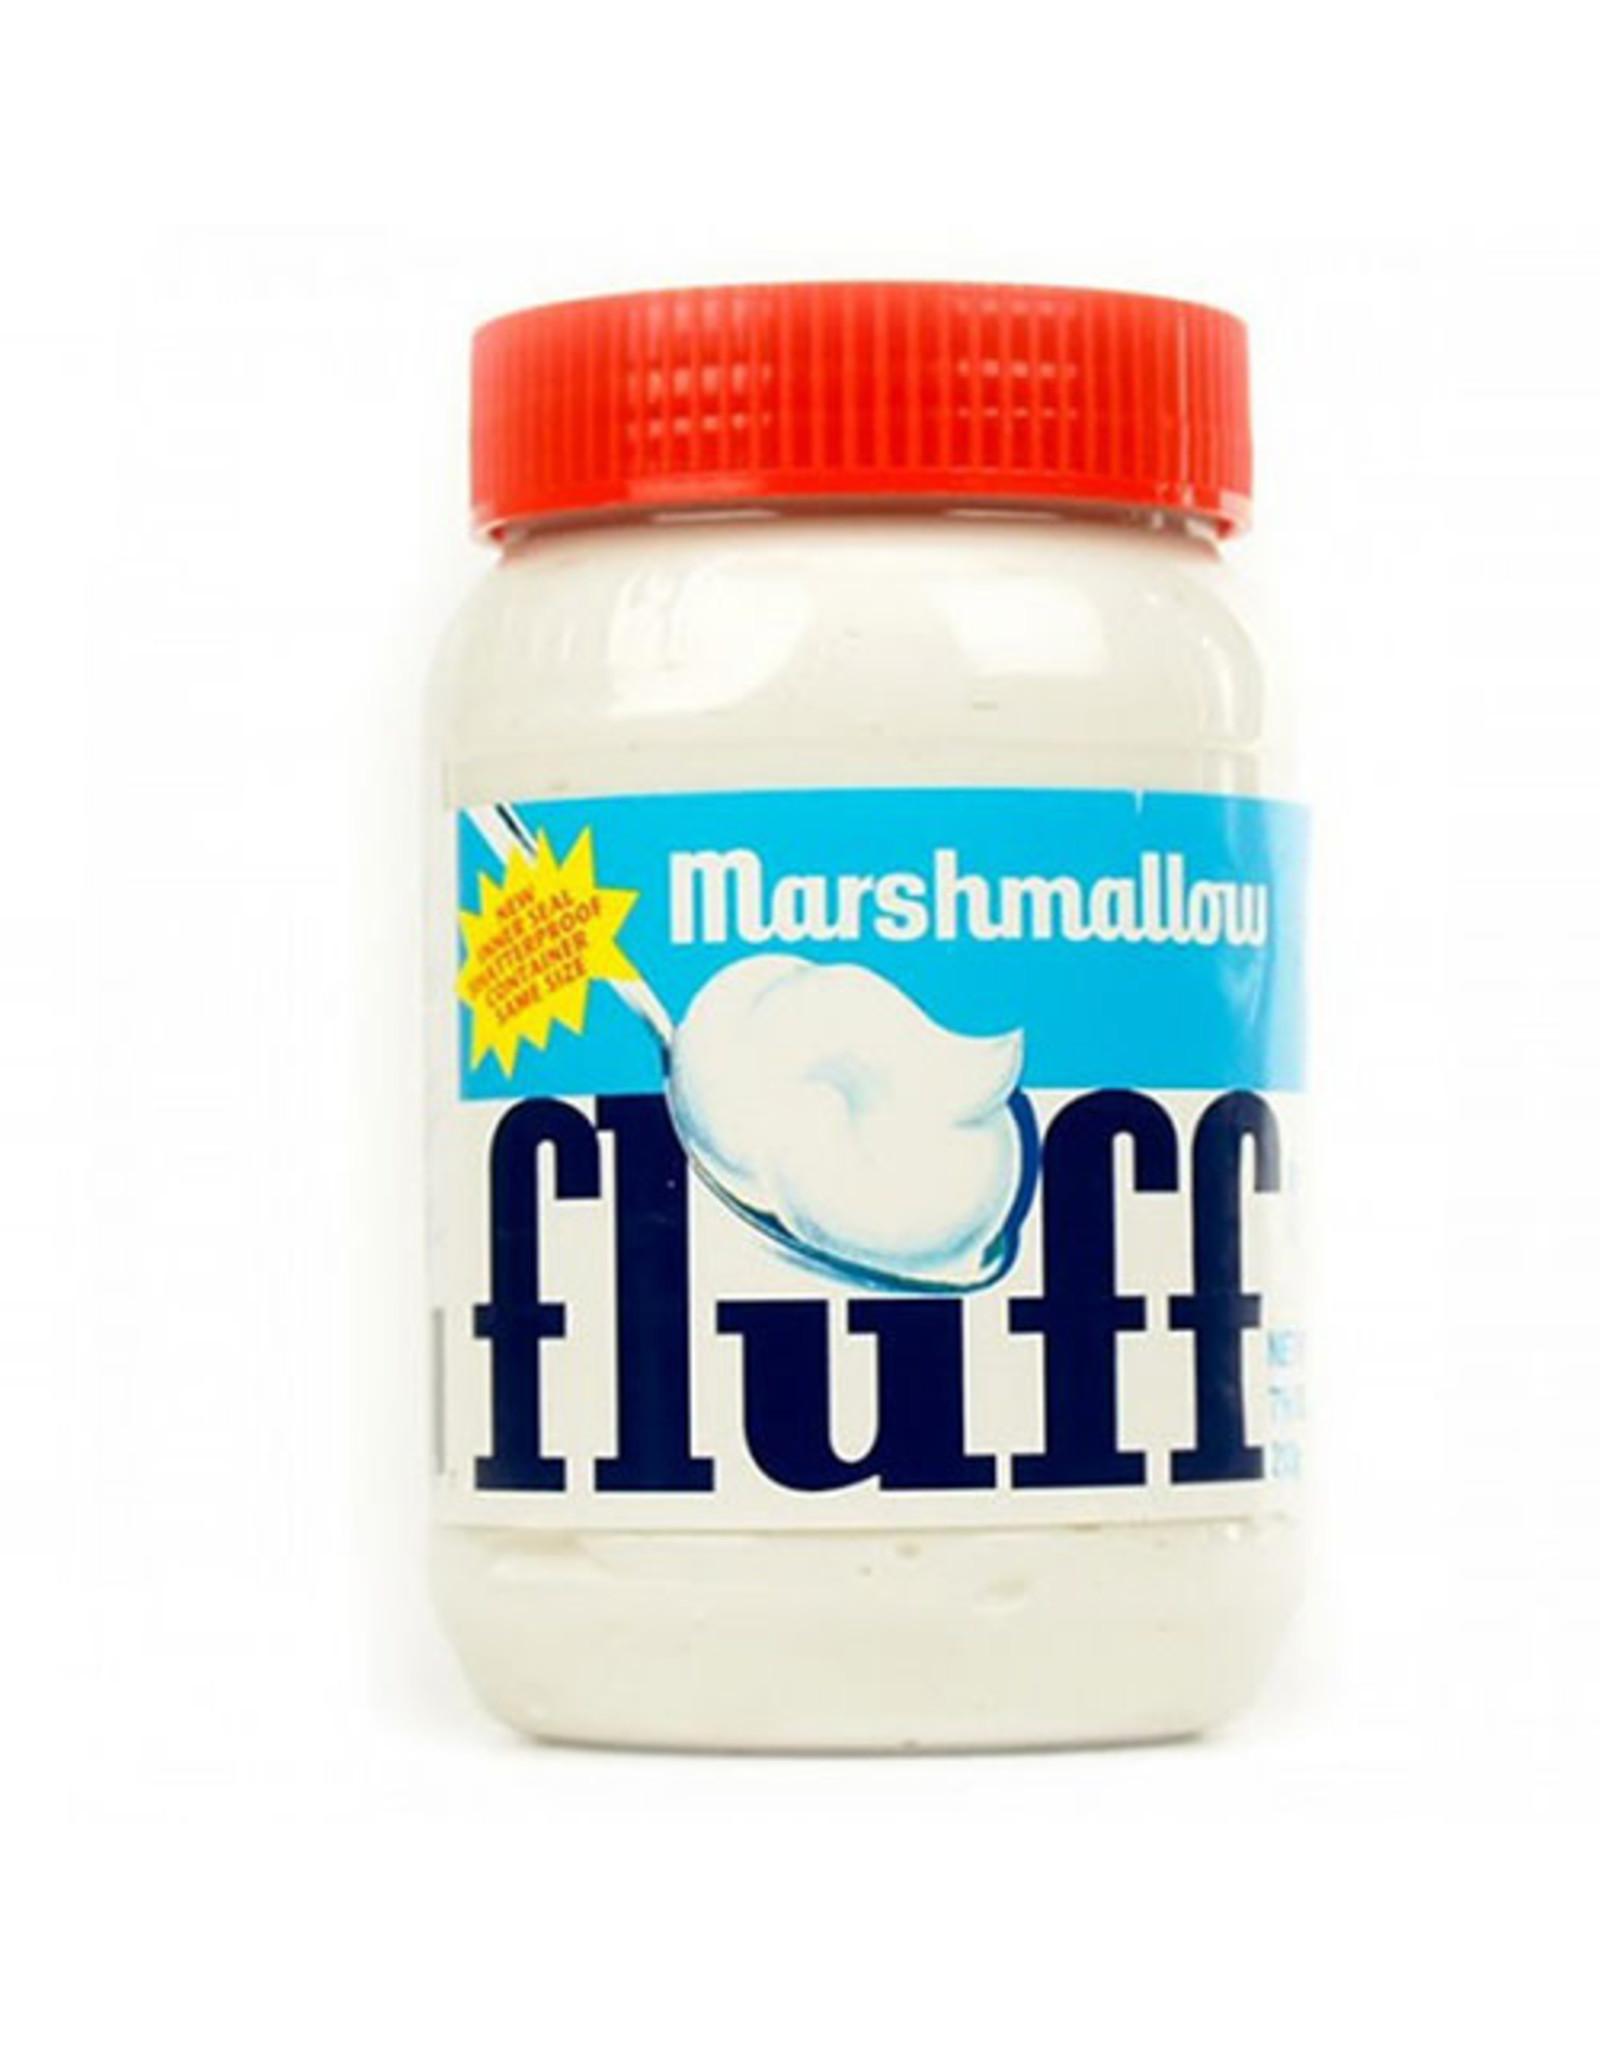 Fluff - Marshmallow fluff - Vanilla - 213g